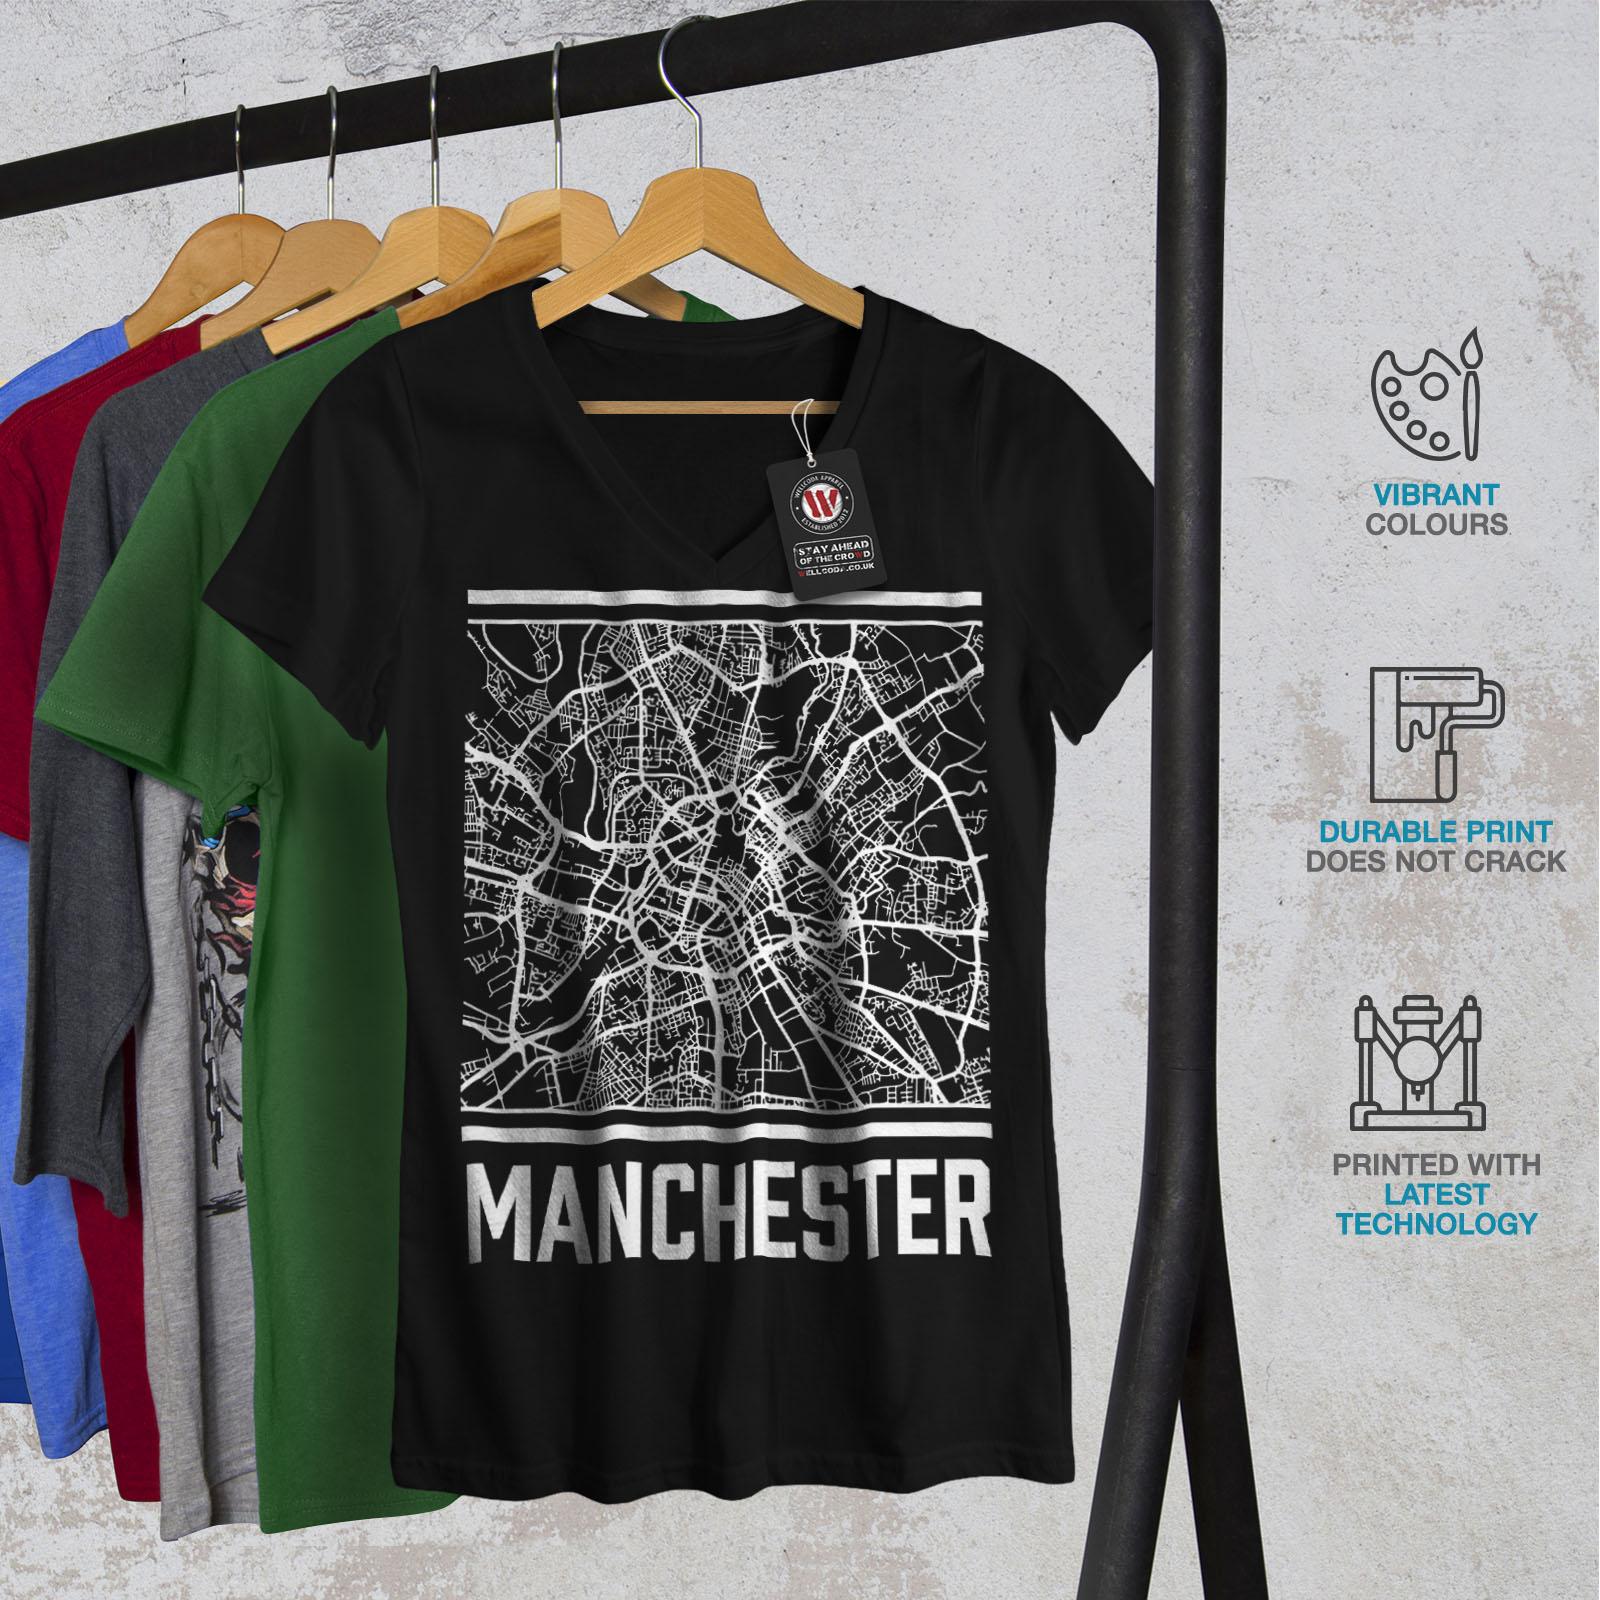 47633b60 T Shirt Design Software Uk | Saddha